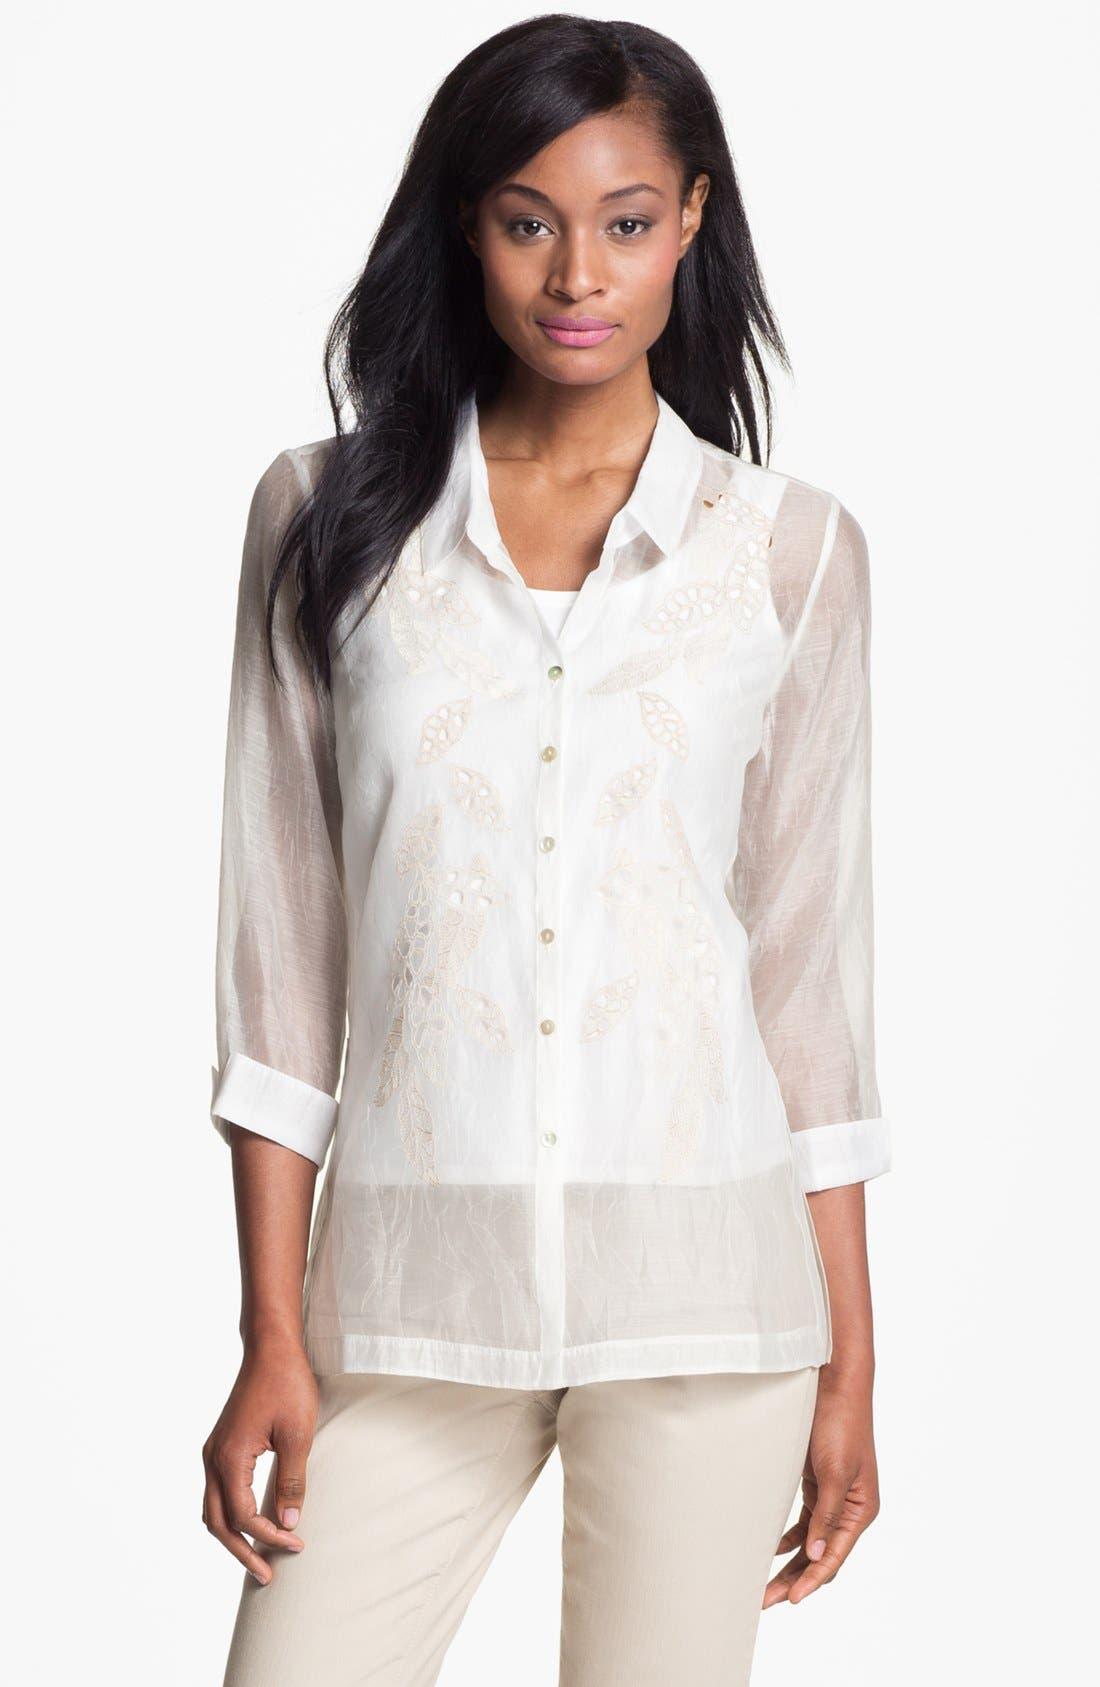 Main Image - Nic + Zoe 'Embroidered Shores' Shirt (Petite)